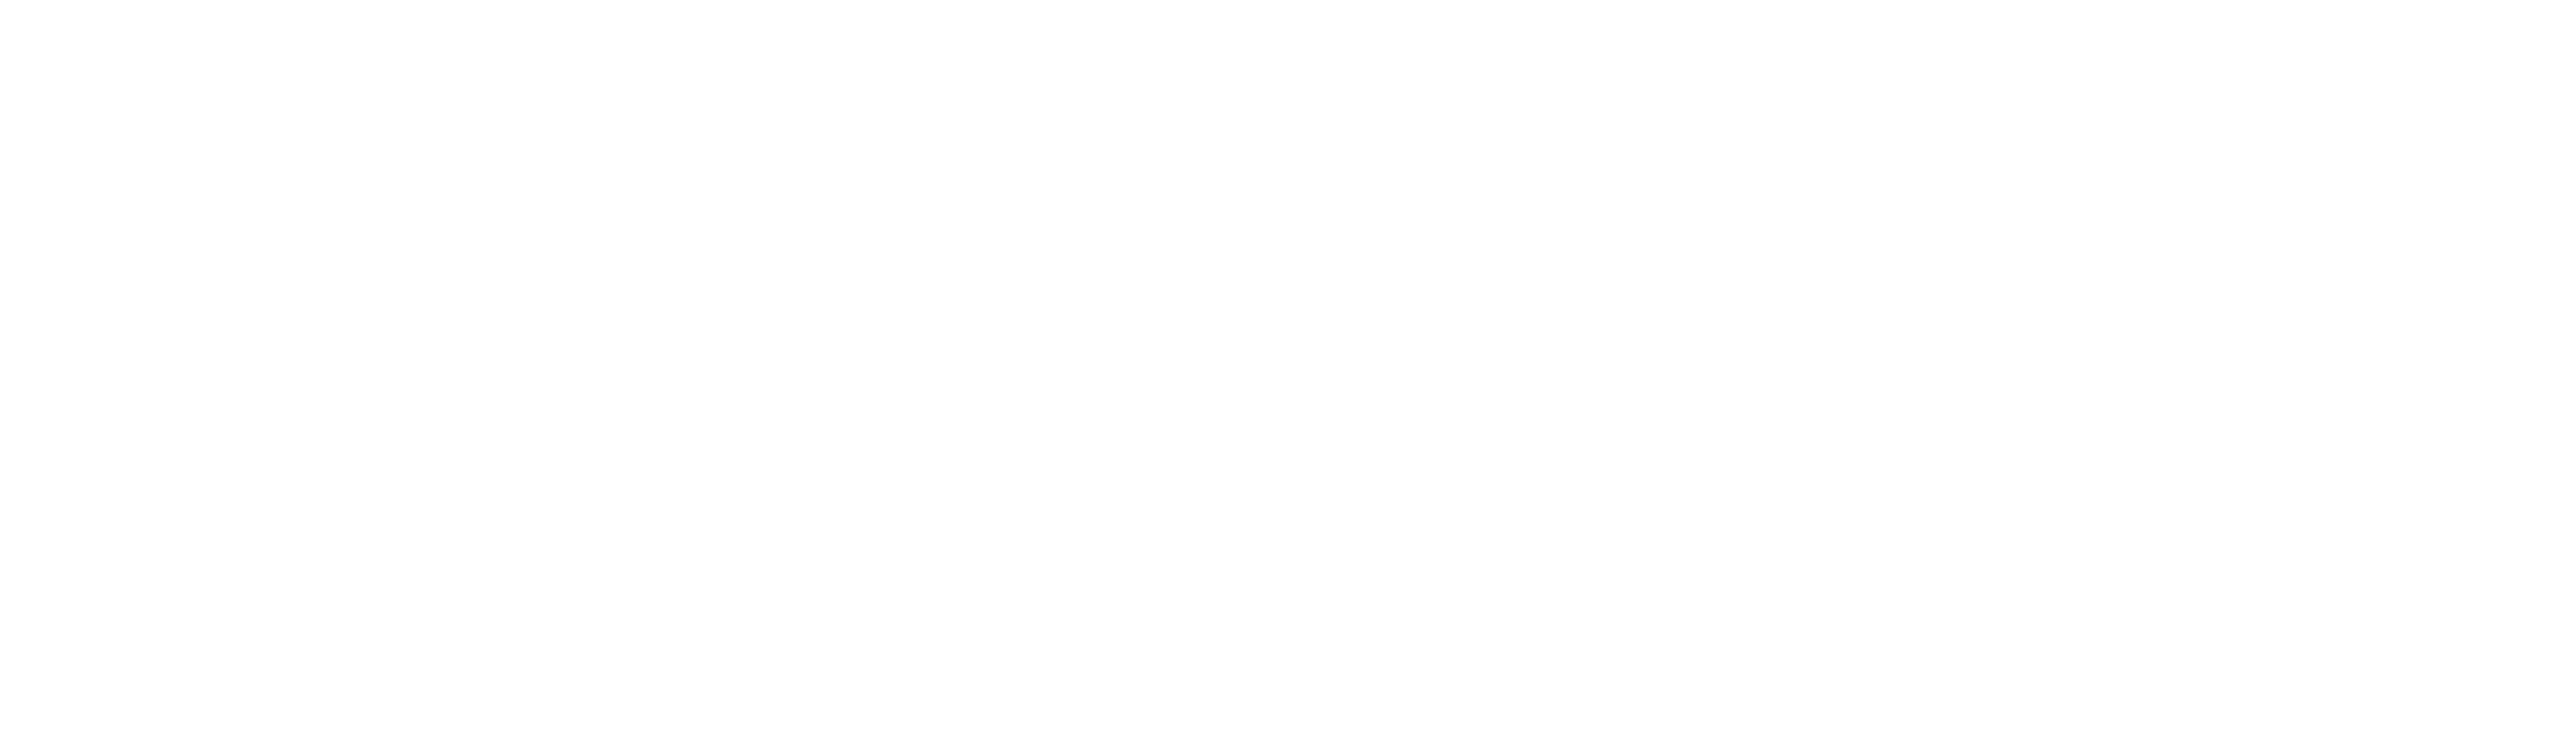 US Tech Vets 3 - White